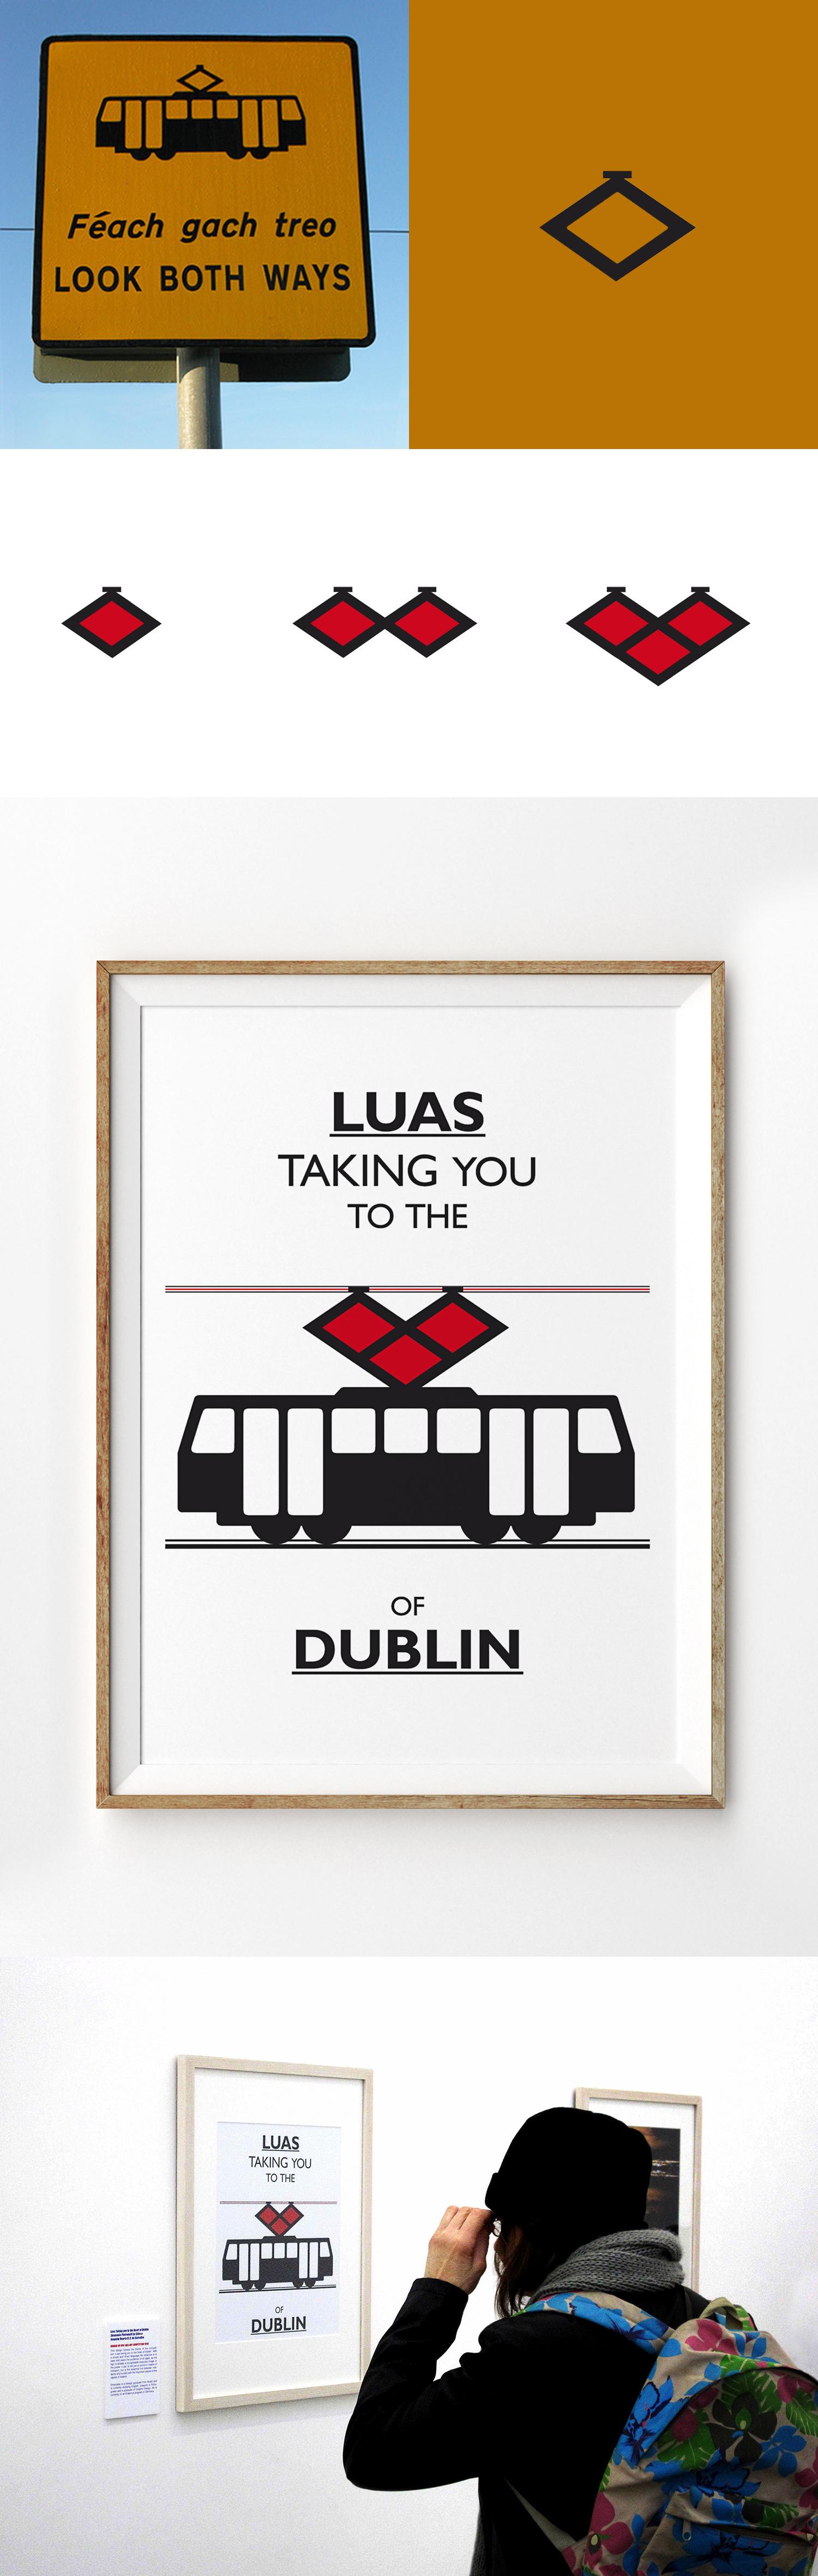 Poster design dublin - Luas Poster Dublin Irland Poster Design Graphic Design Jestudio